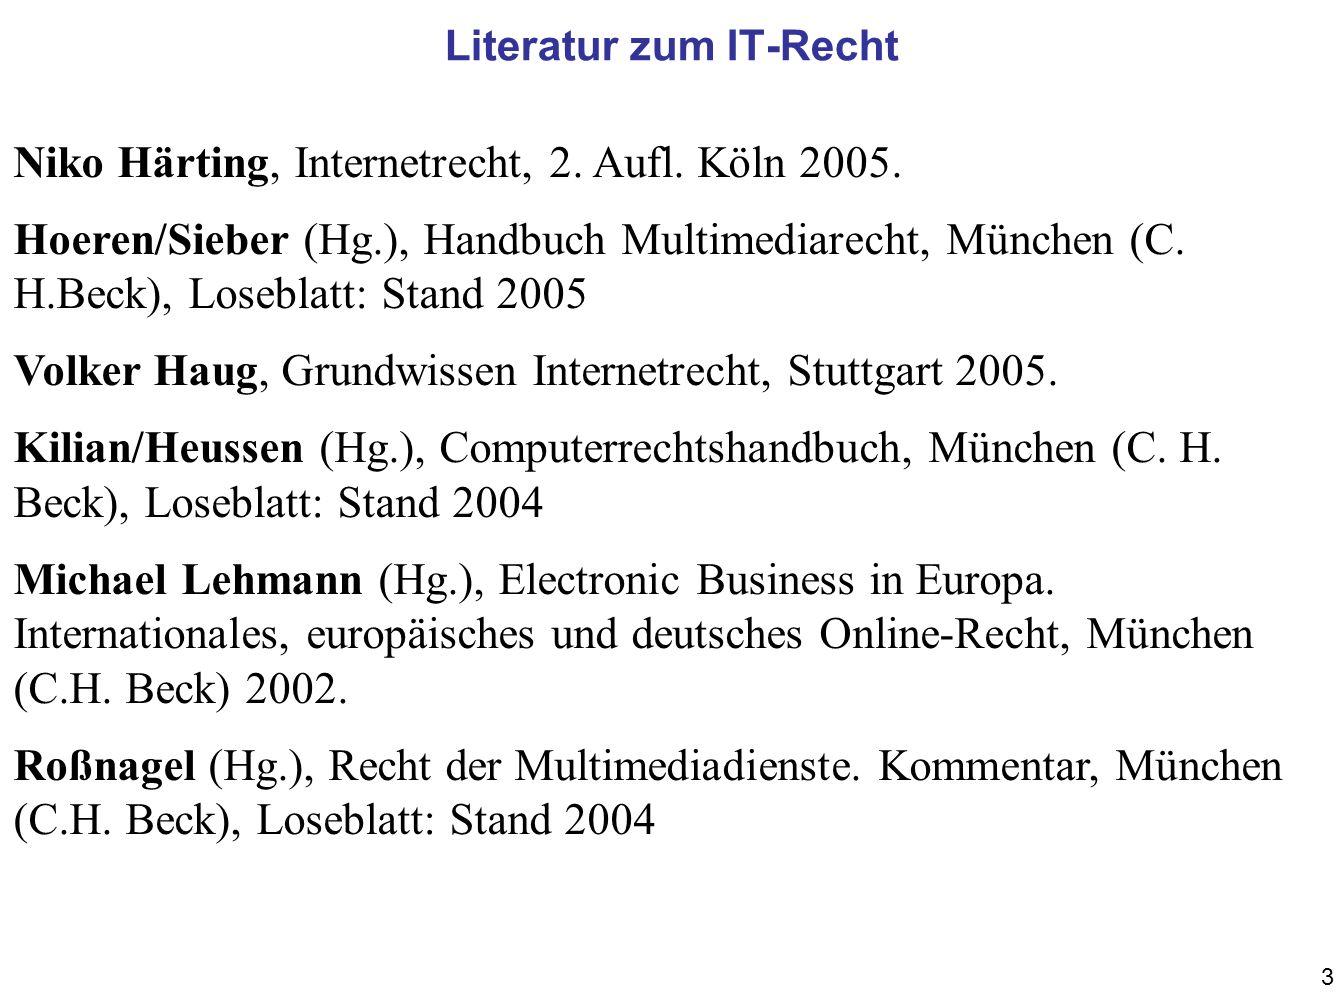 3 Niko Härting, Internetrecht, 2. Aufl. Köln 2005. Hoeren/Sieber (Hg.), Handbuch Multimediarecht, München (C. H.Beck), Loseblatt: Stand 2005 Volker Ha